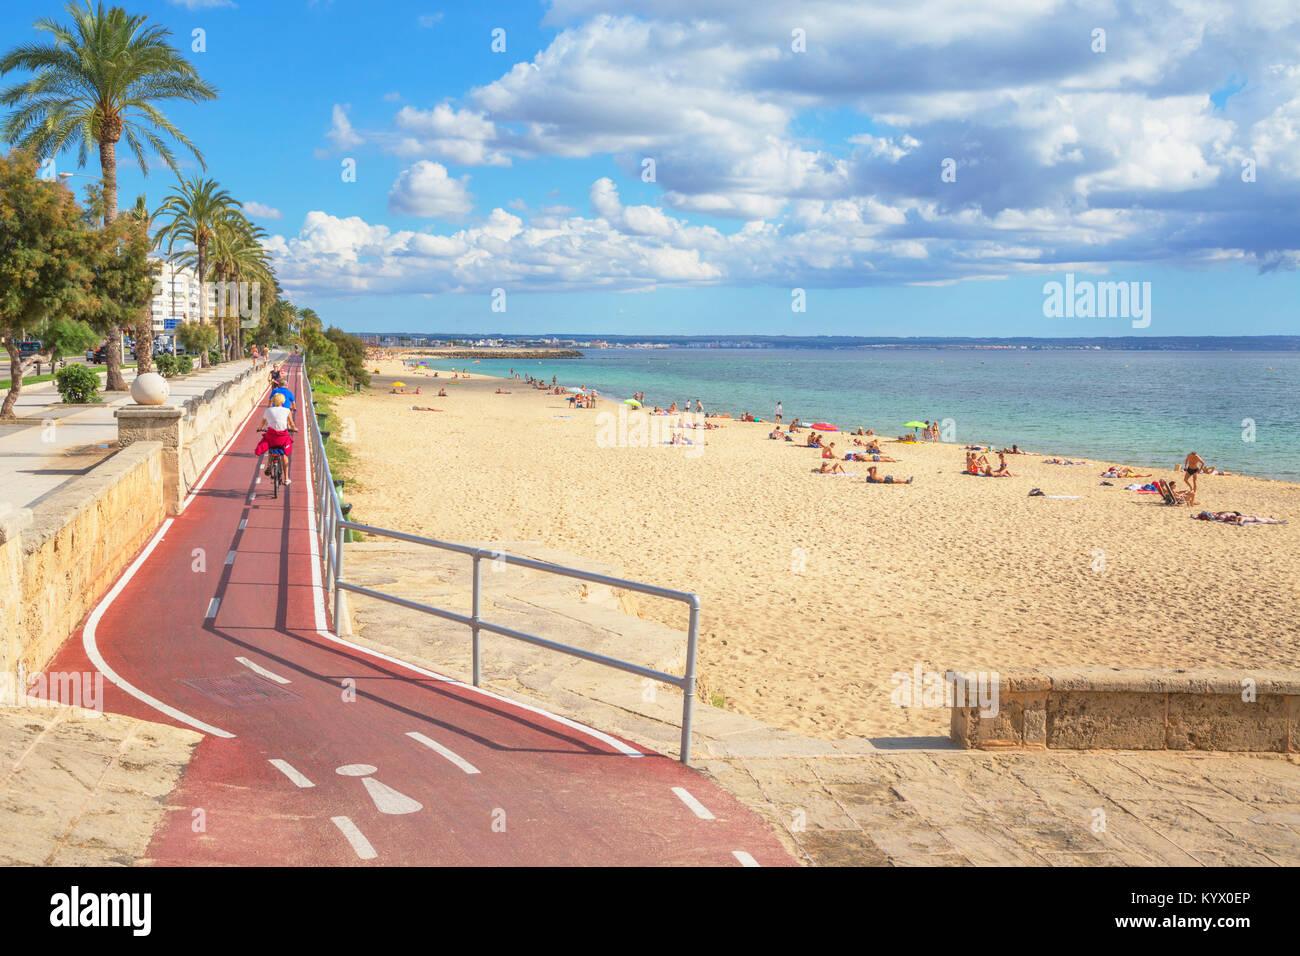 palma strand neben dem fahrrad route